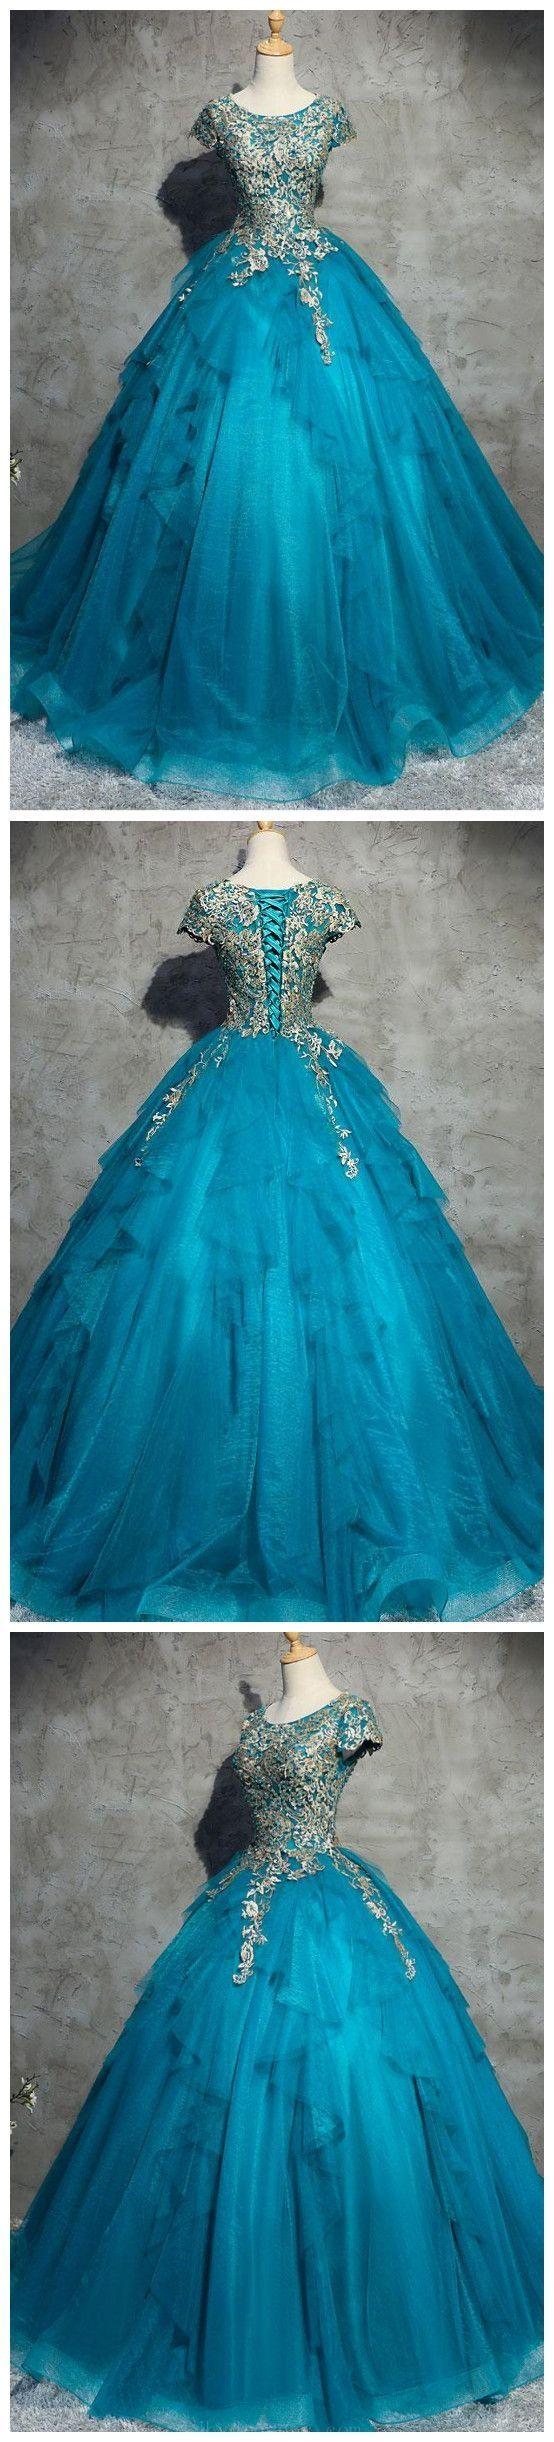 Custom made nice prom dresses prom dresses long prom dresses